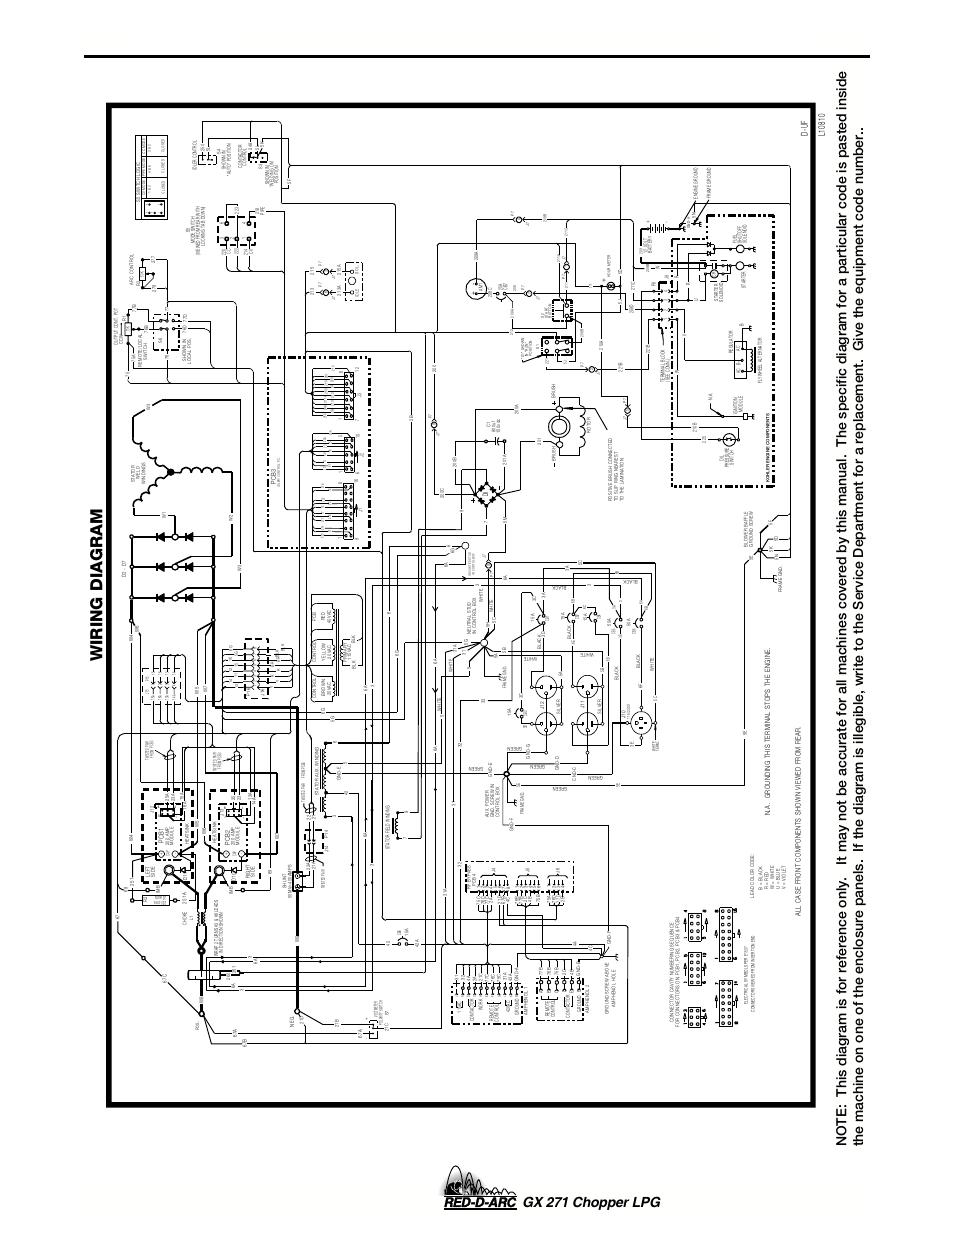 hight resolution of diagrams gx 271 chopper lpg wiring diagram lincoln electric im635 red d arc gx 271chopper lpg user manual page 44 48